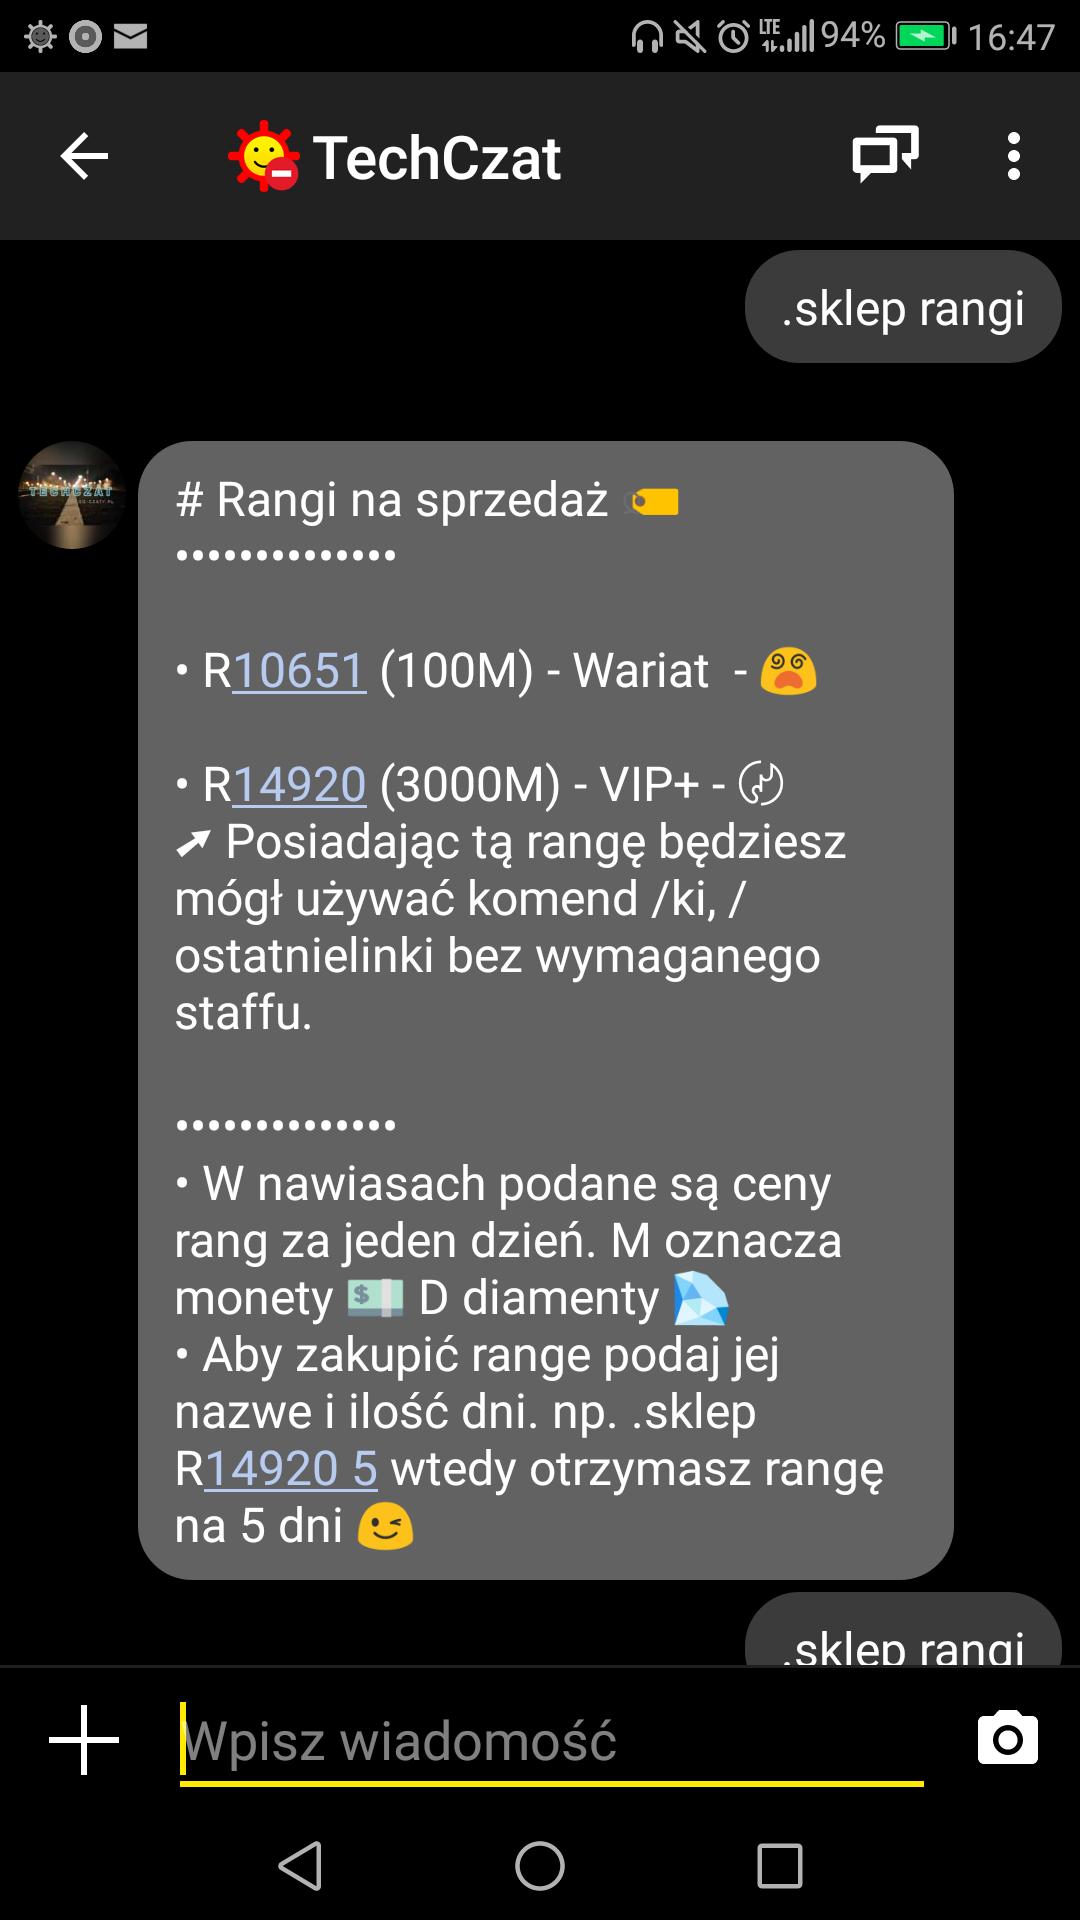 Screenshot_20181103-164756.png